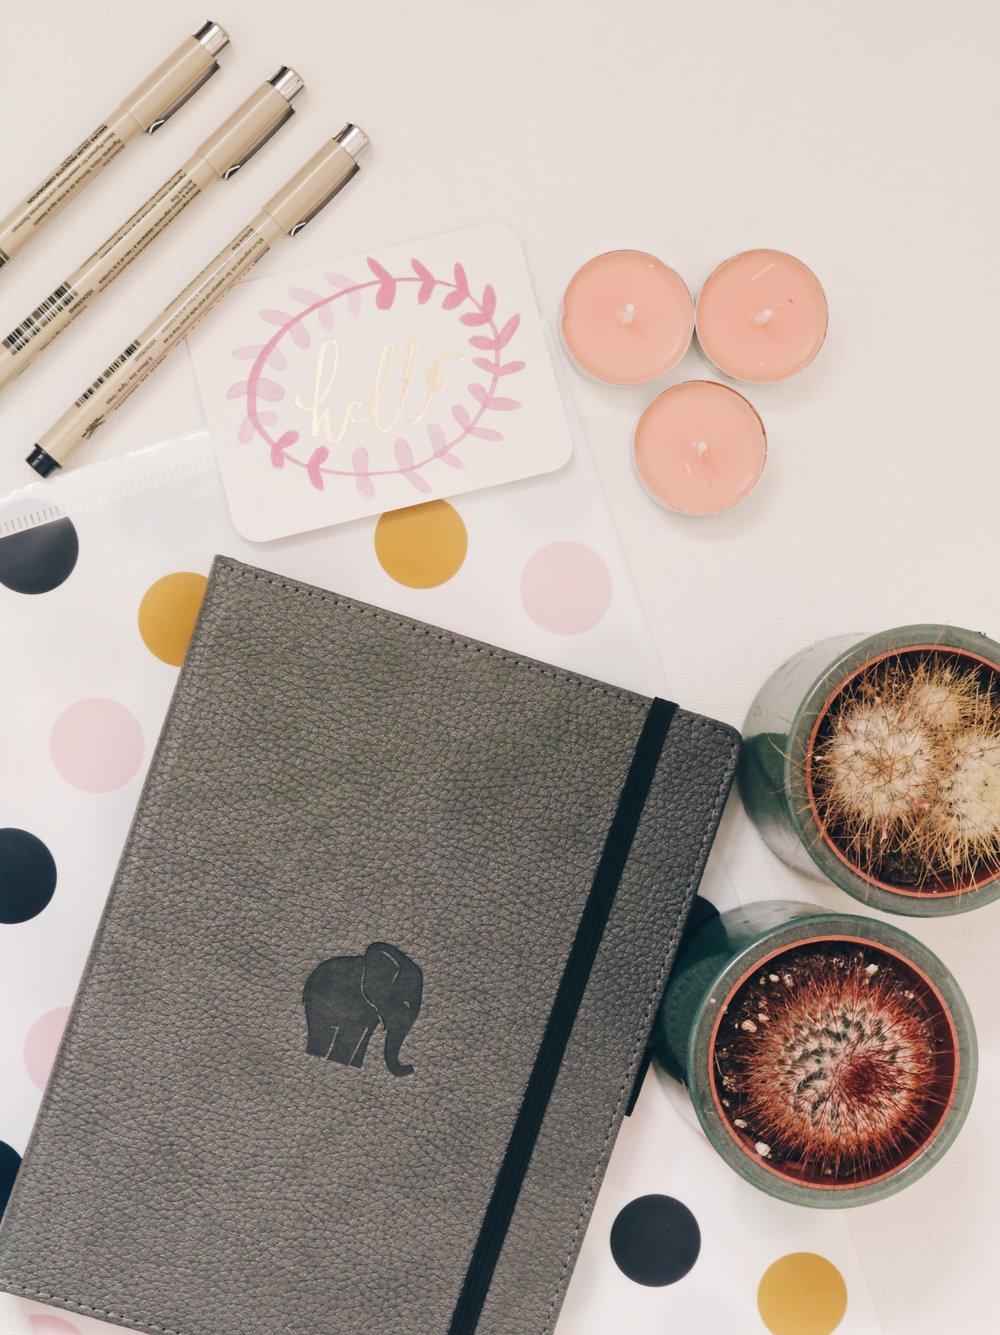 6 Pressures Of Bullet Journaling